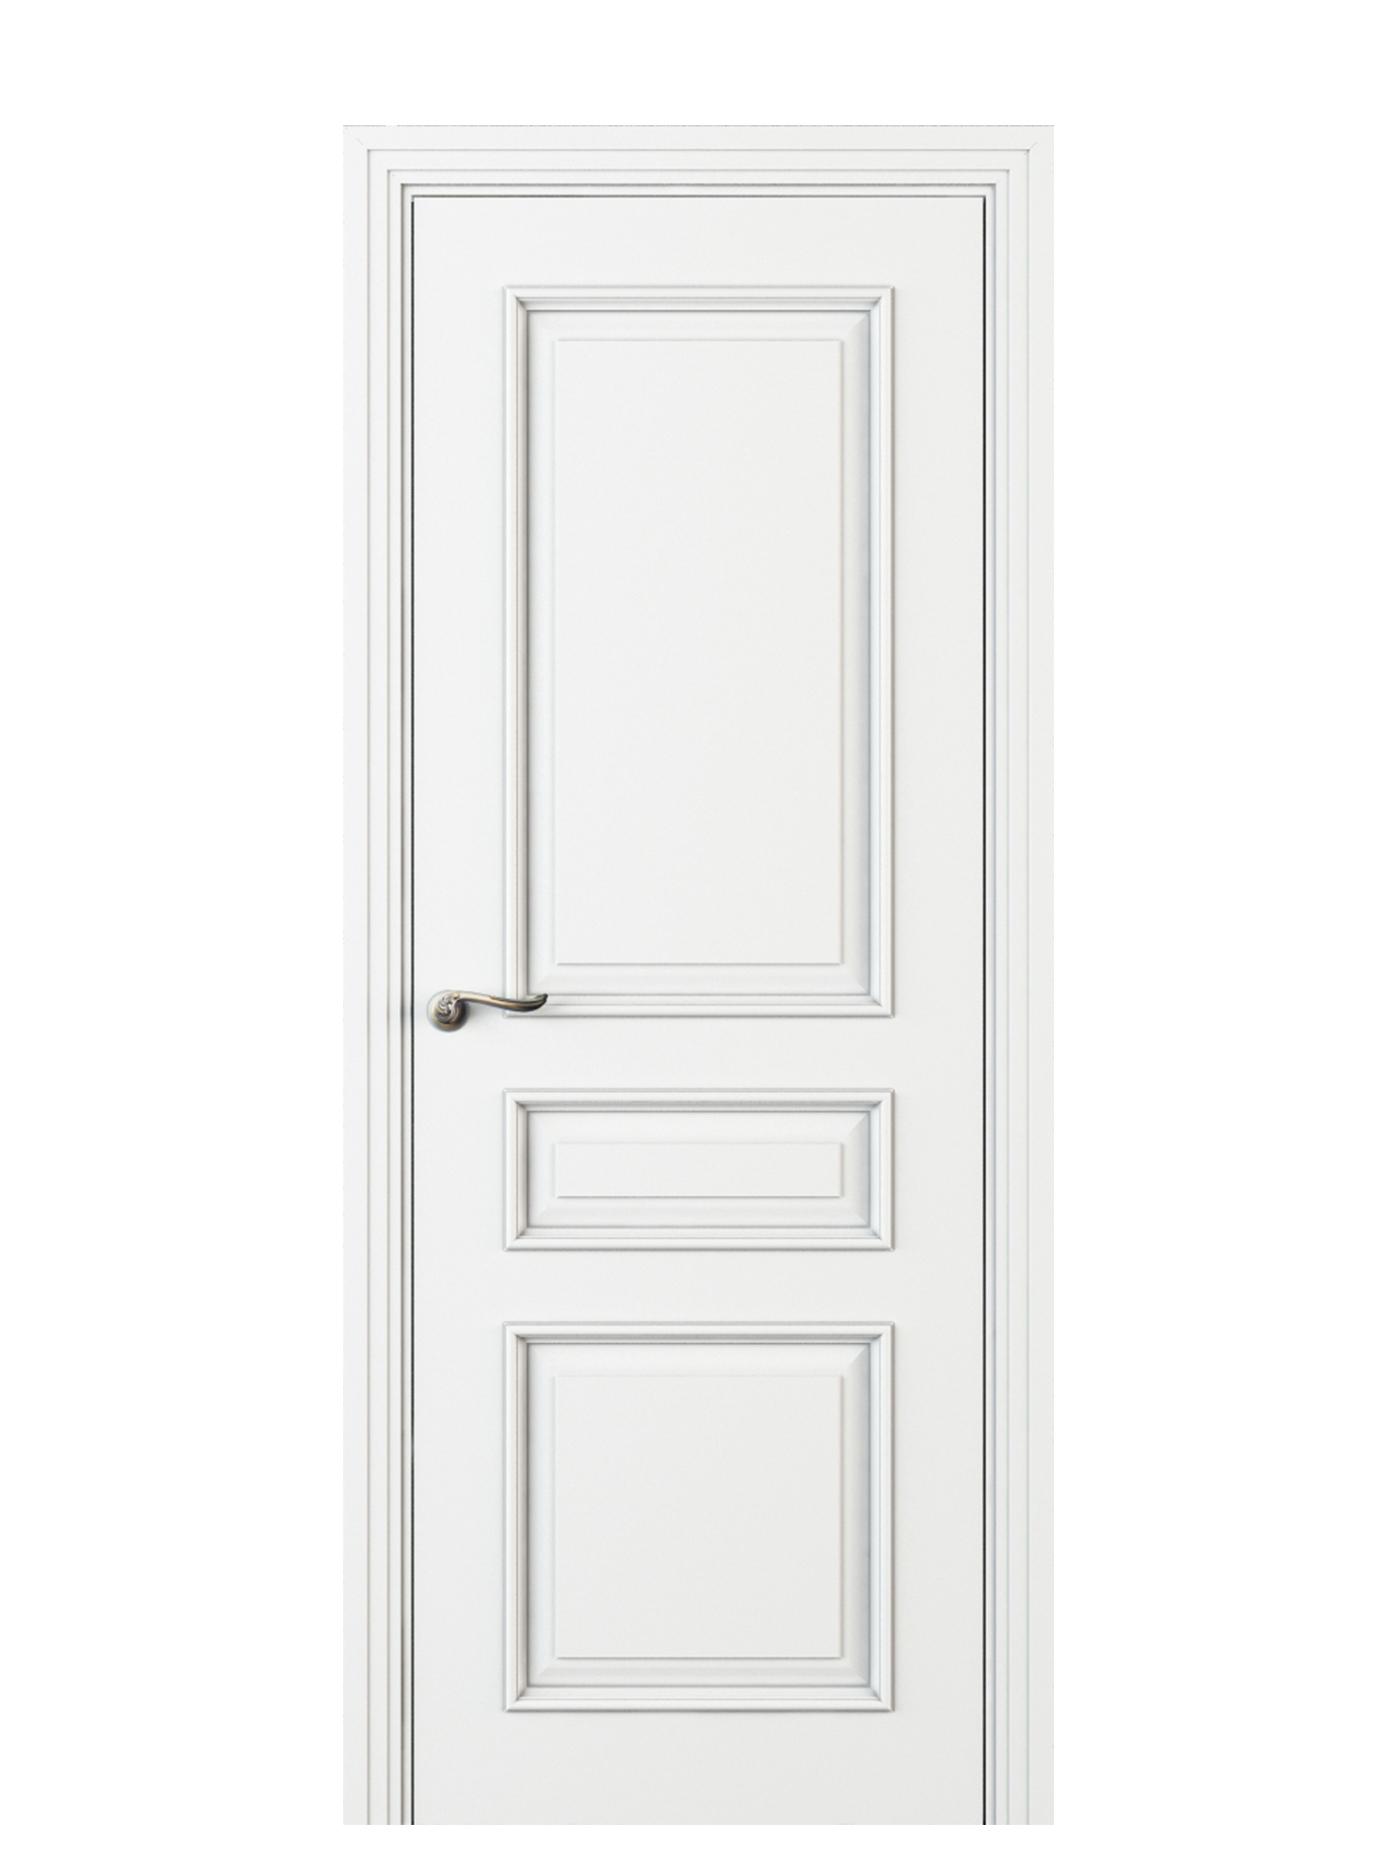 Image Fellini Interior Door Italian Enamel White 0